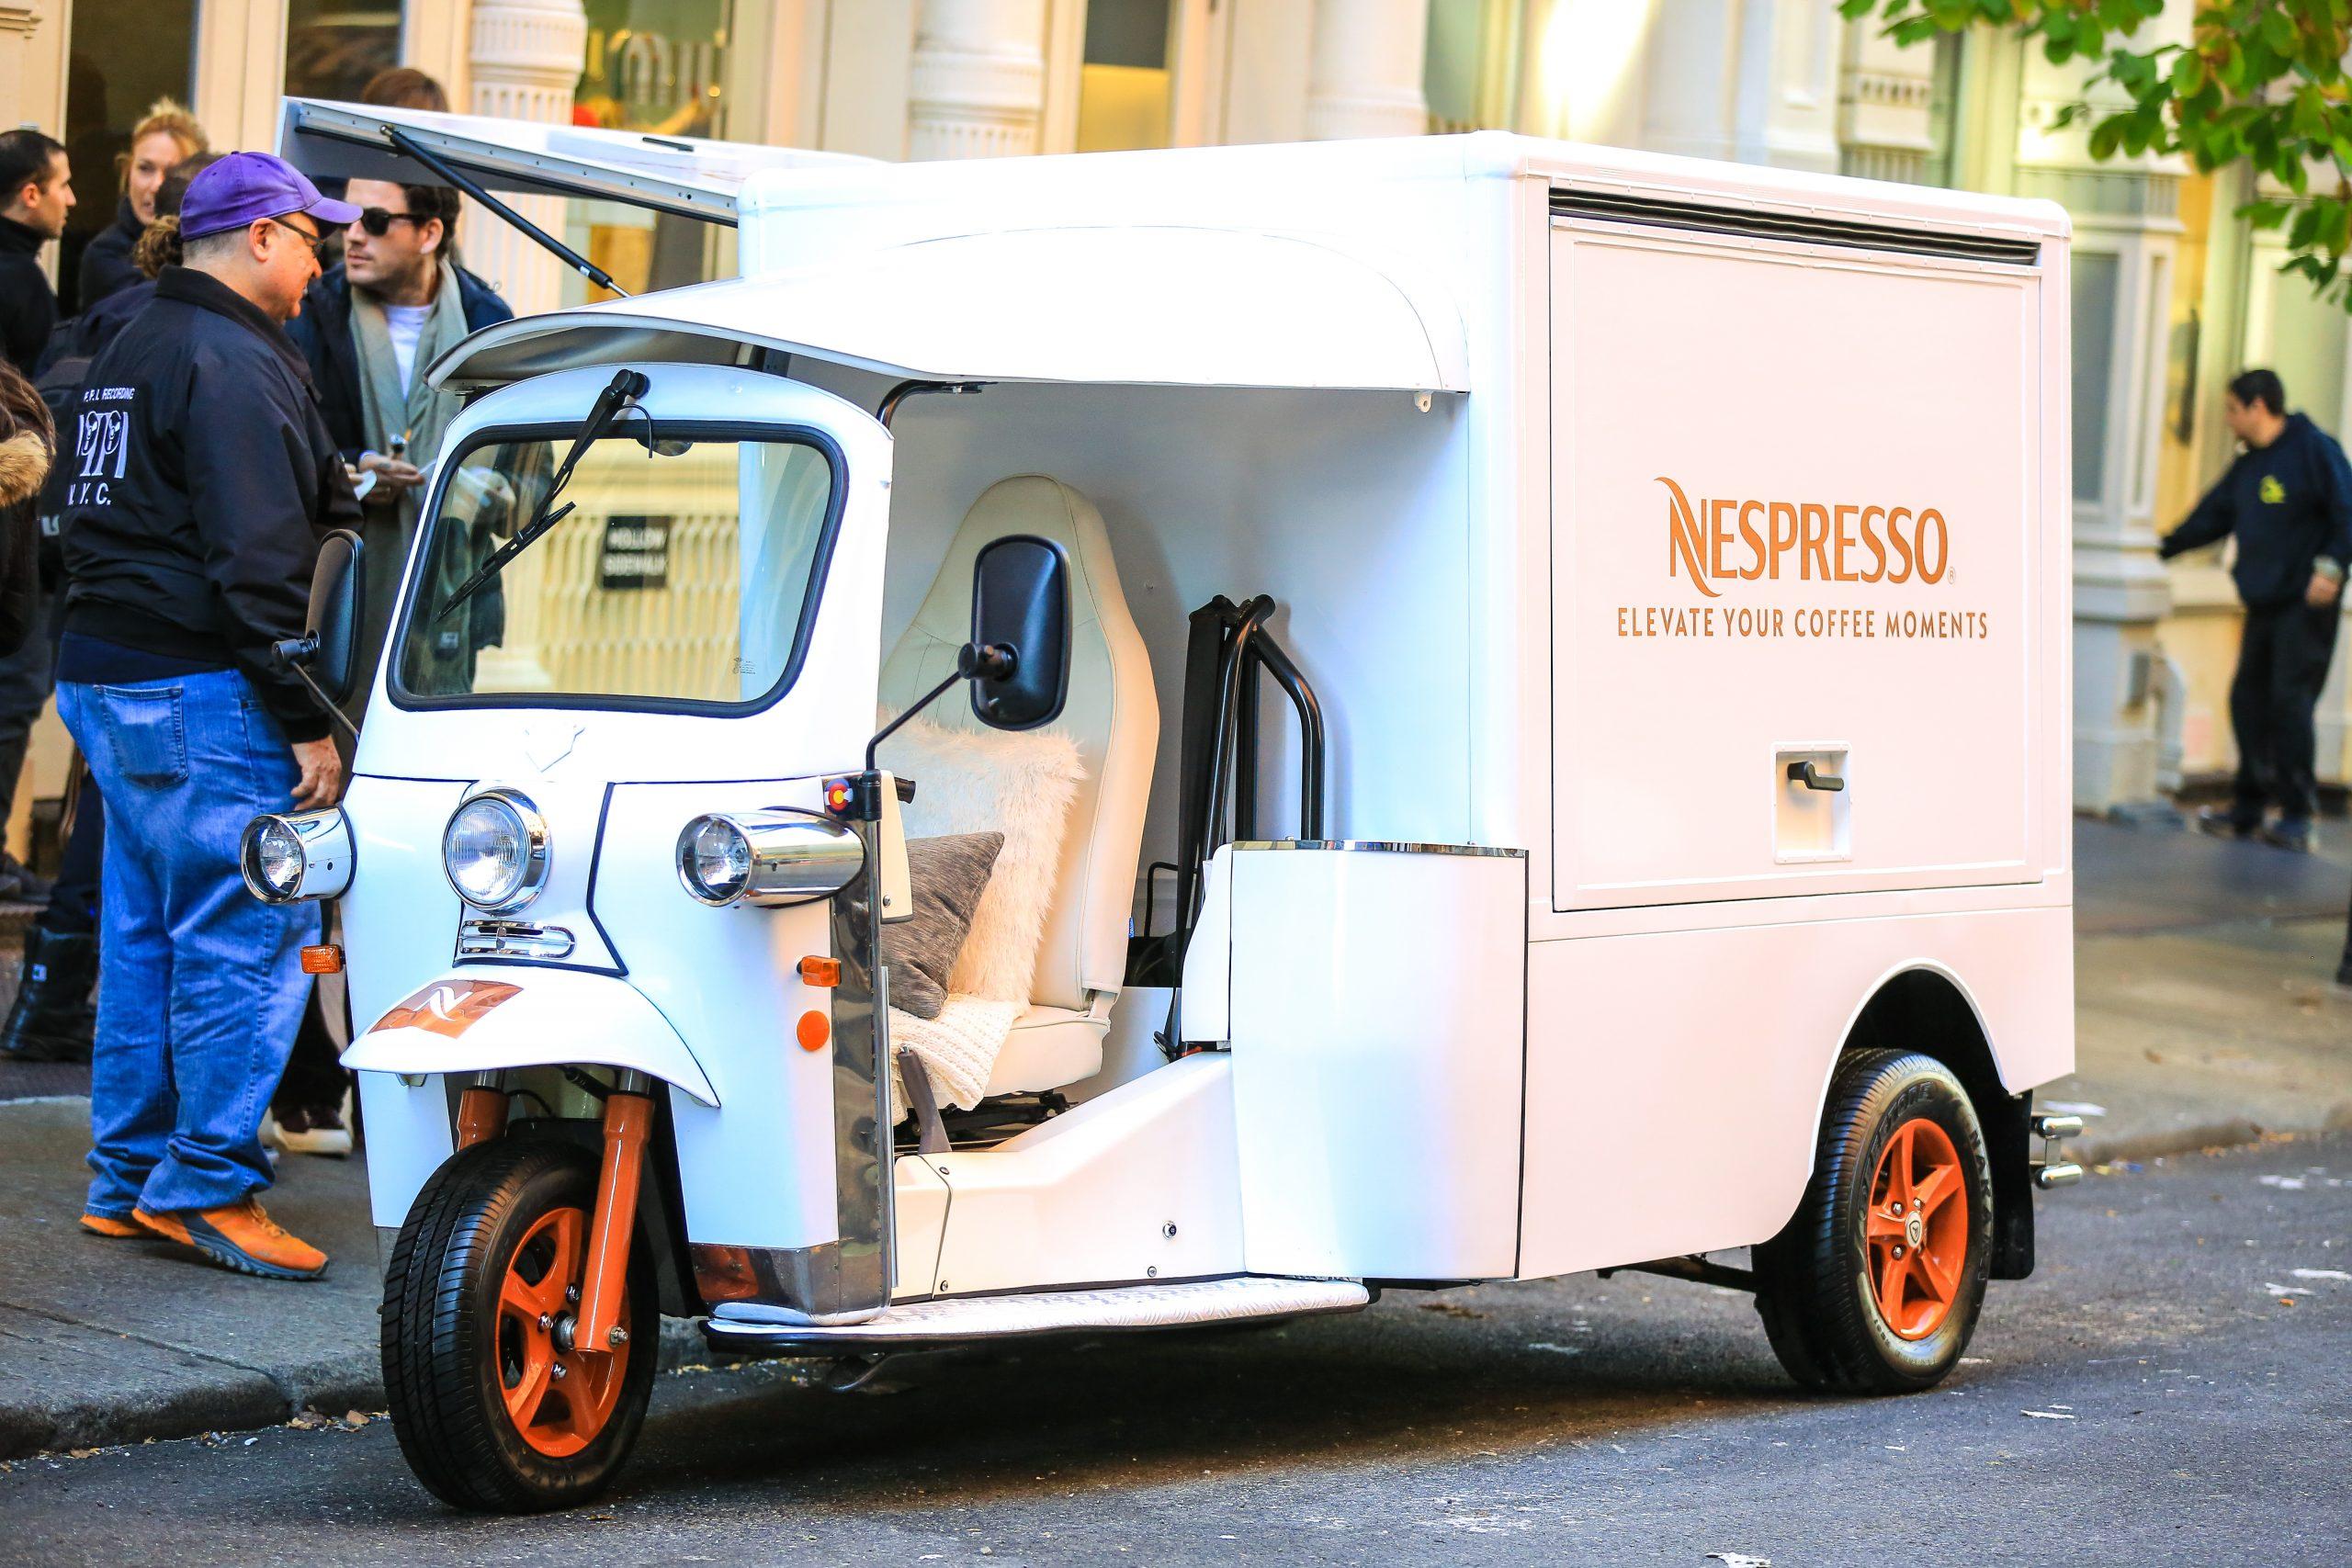 Nespresso Mobile Marketing Tour Example